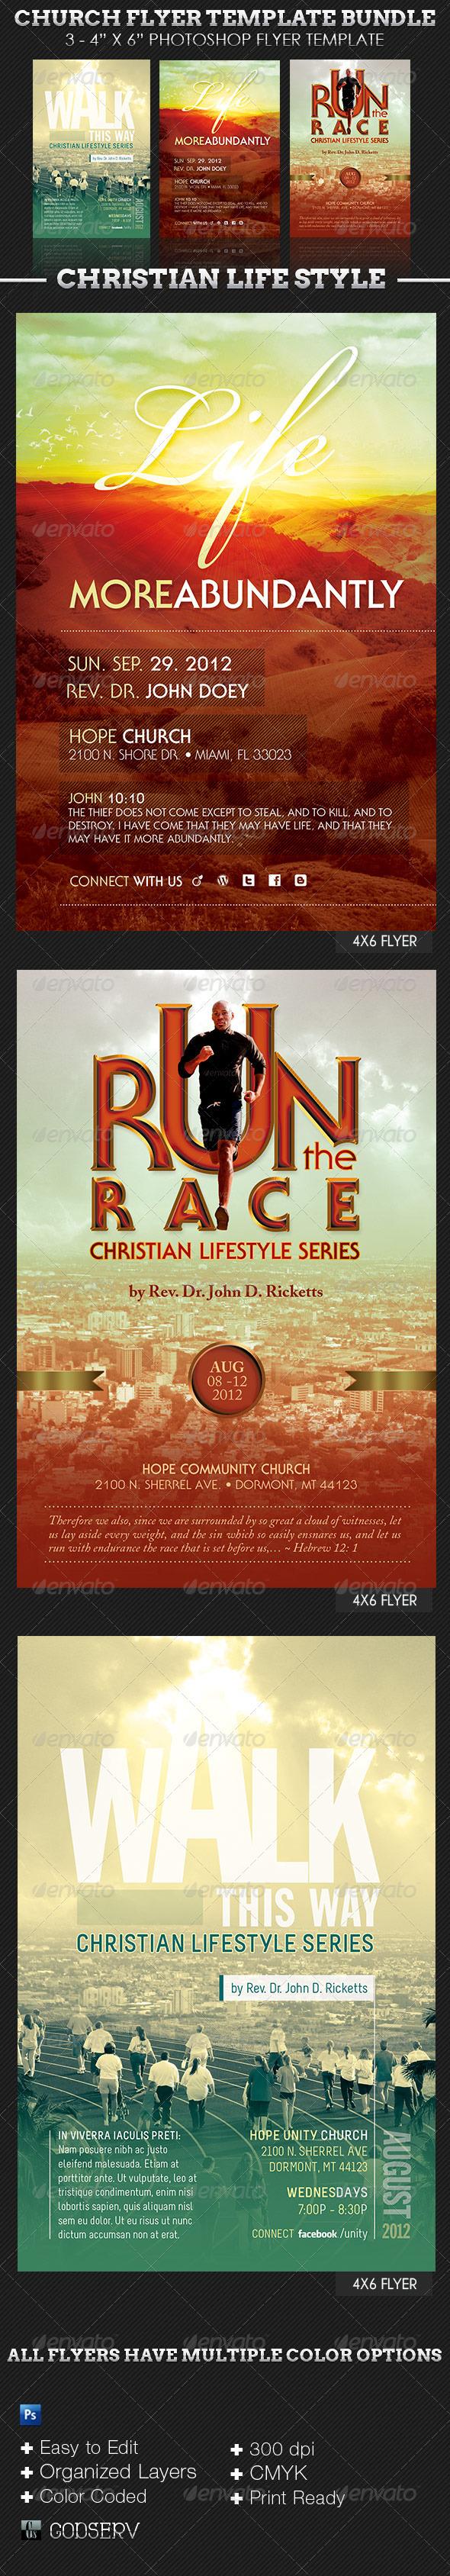 Church Flyer Template Bundle: Christian Lifestyle - Church Flyers